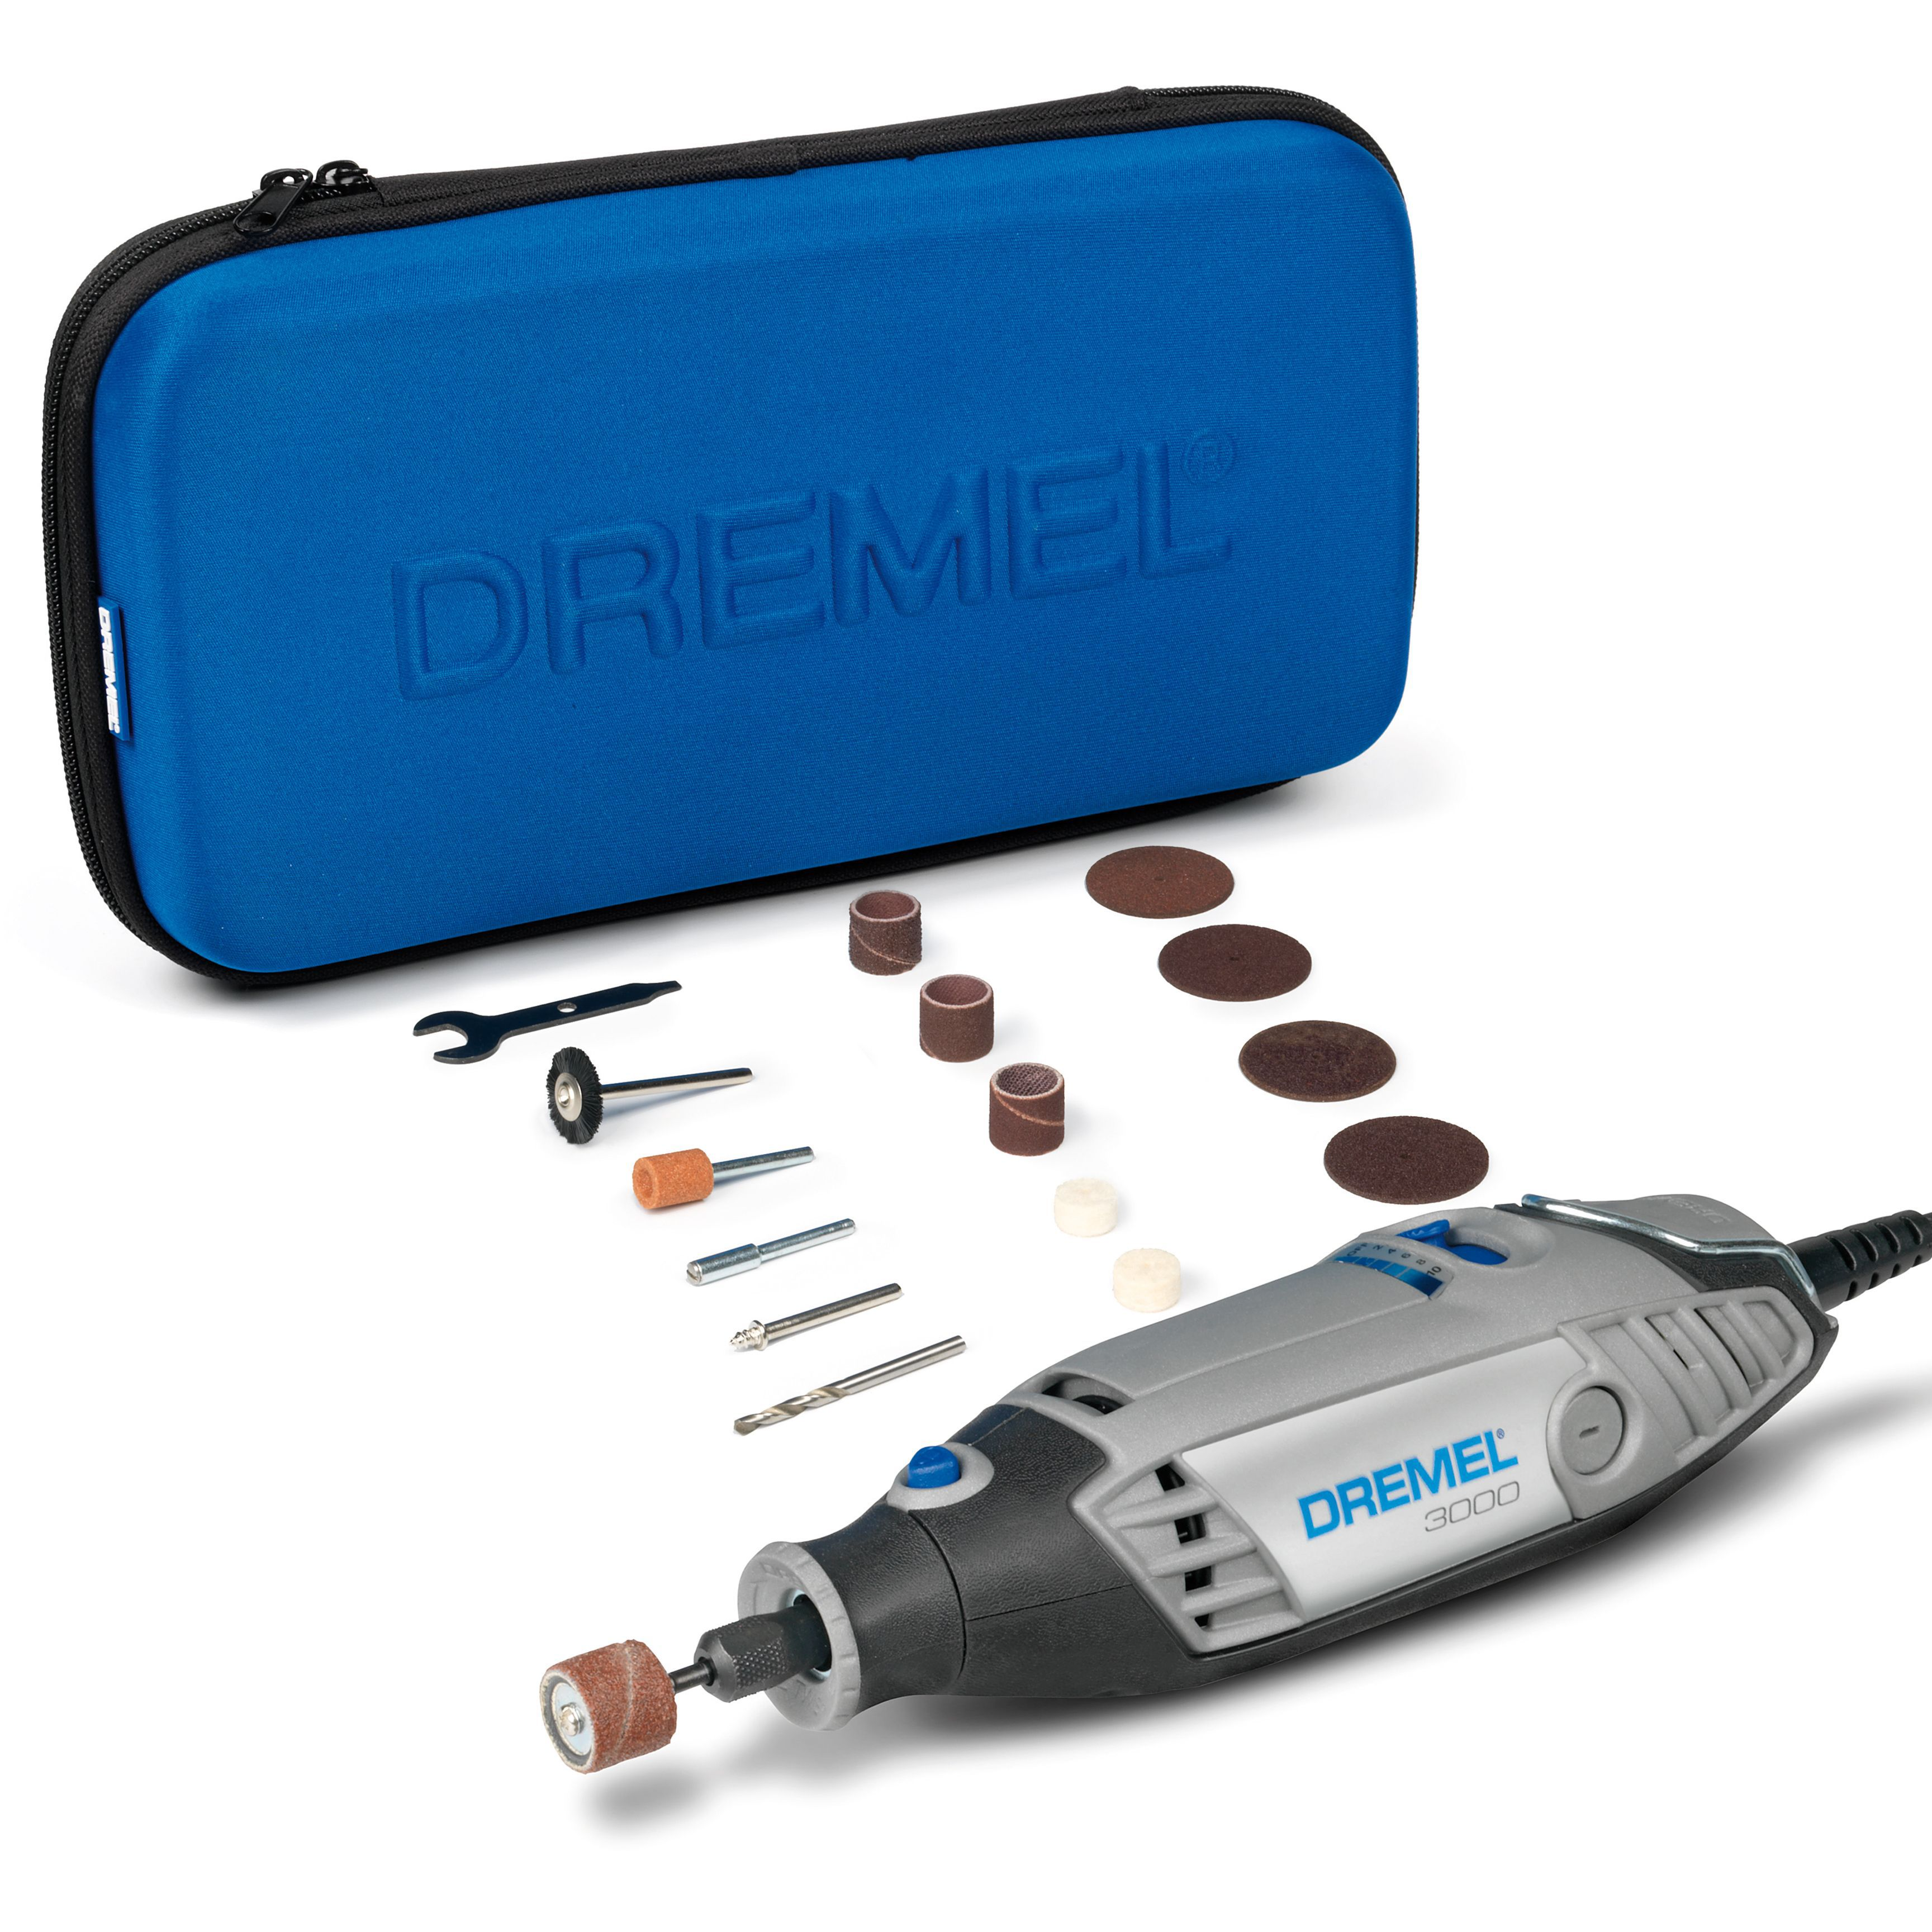 Dremel 230v 130w Corded Multi Tool 3000 Departments